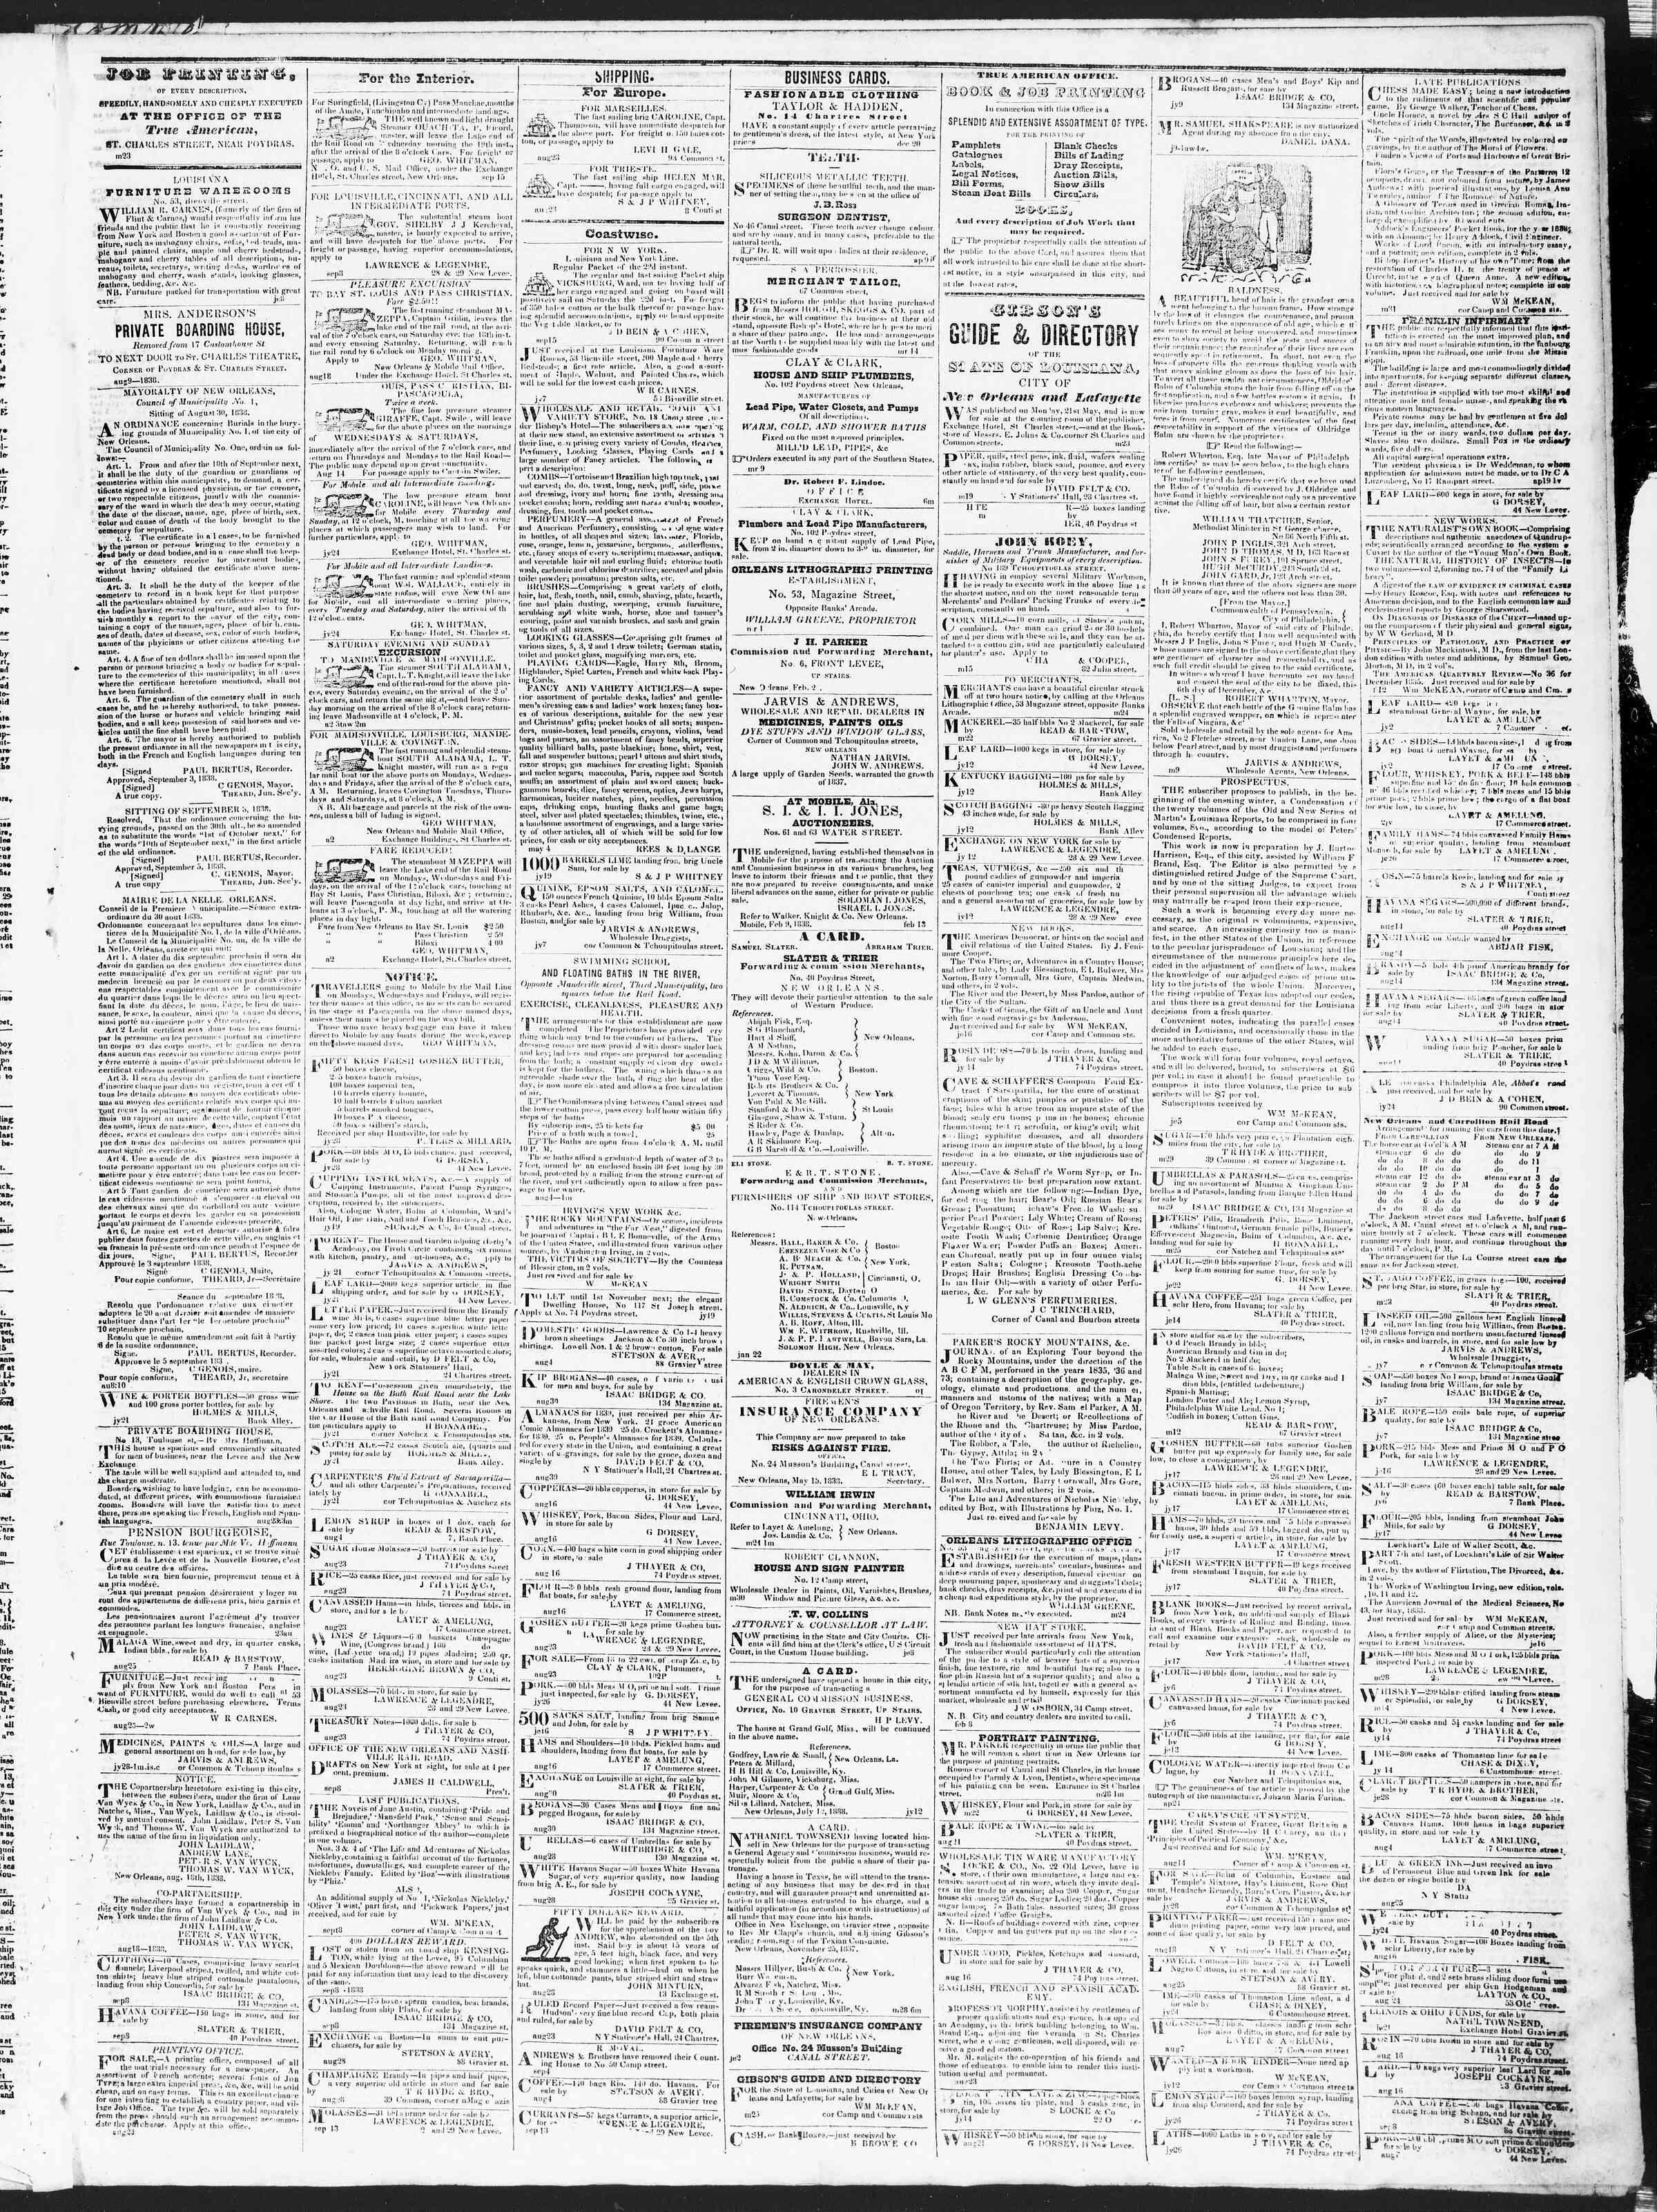 September 22, 1838 Tarihli True American Gazetesi Sayfa 3